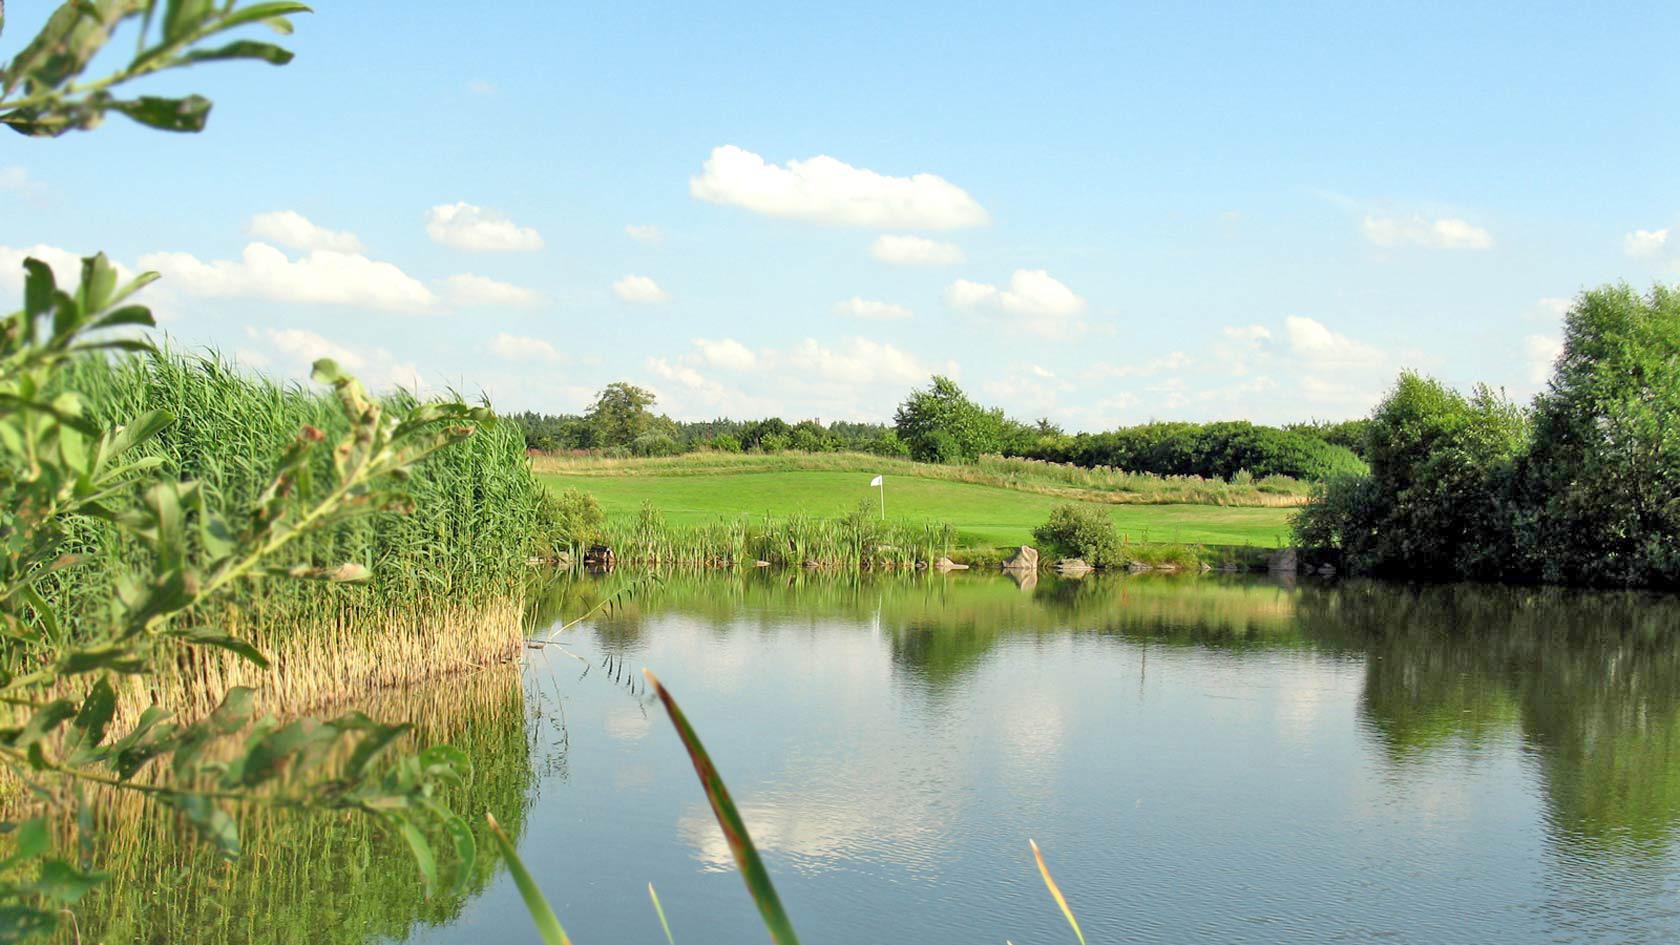 golfplatz_wasser_03.jpg